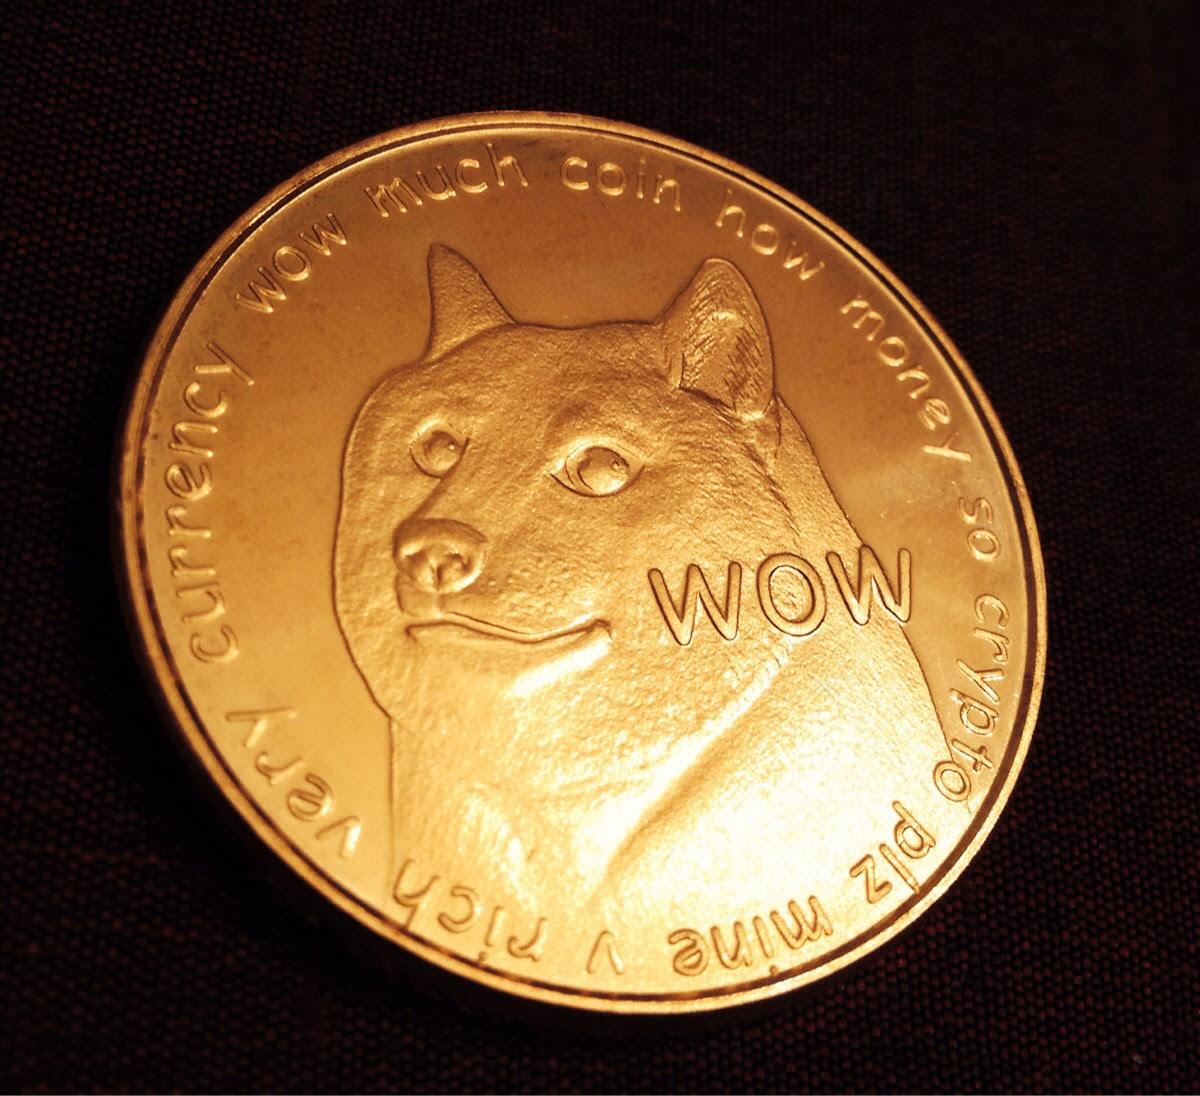 Dogecoin Gold - Novelty Gold Dogecoin Physical Copper Coin ...